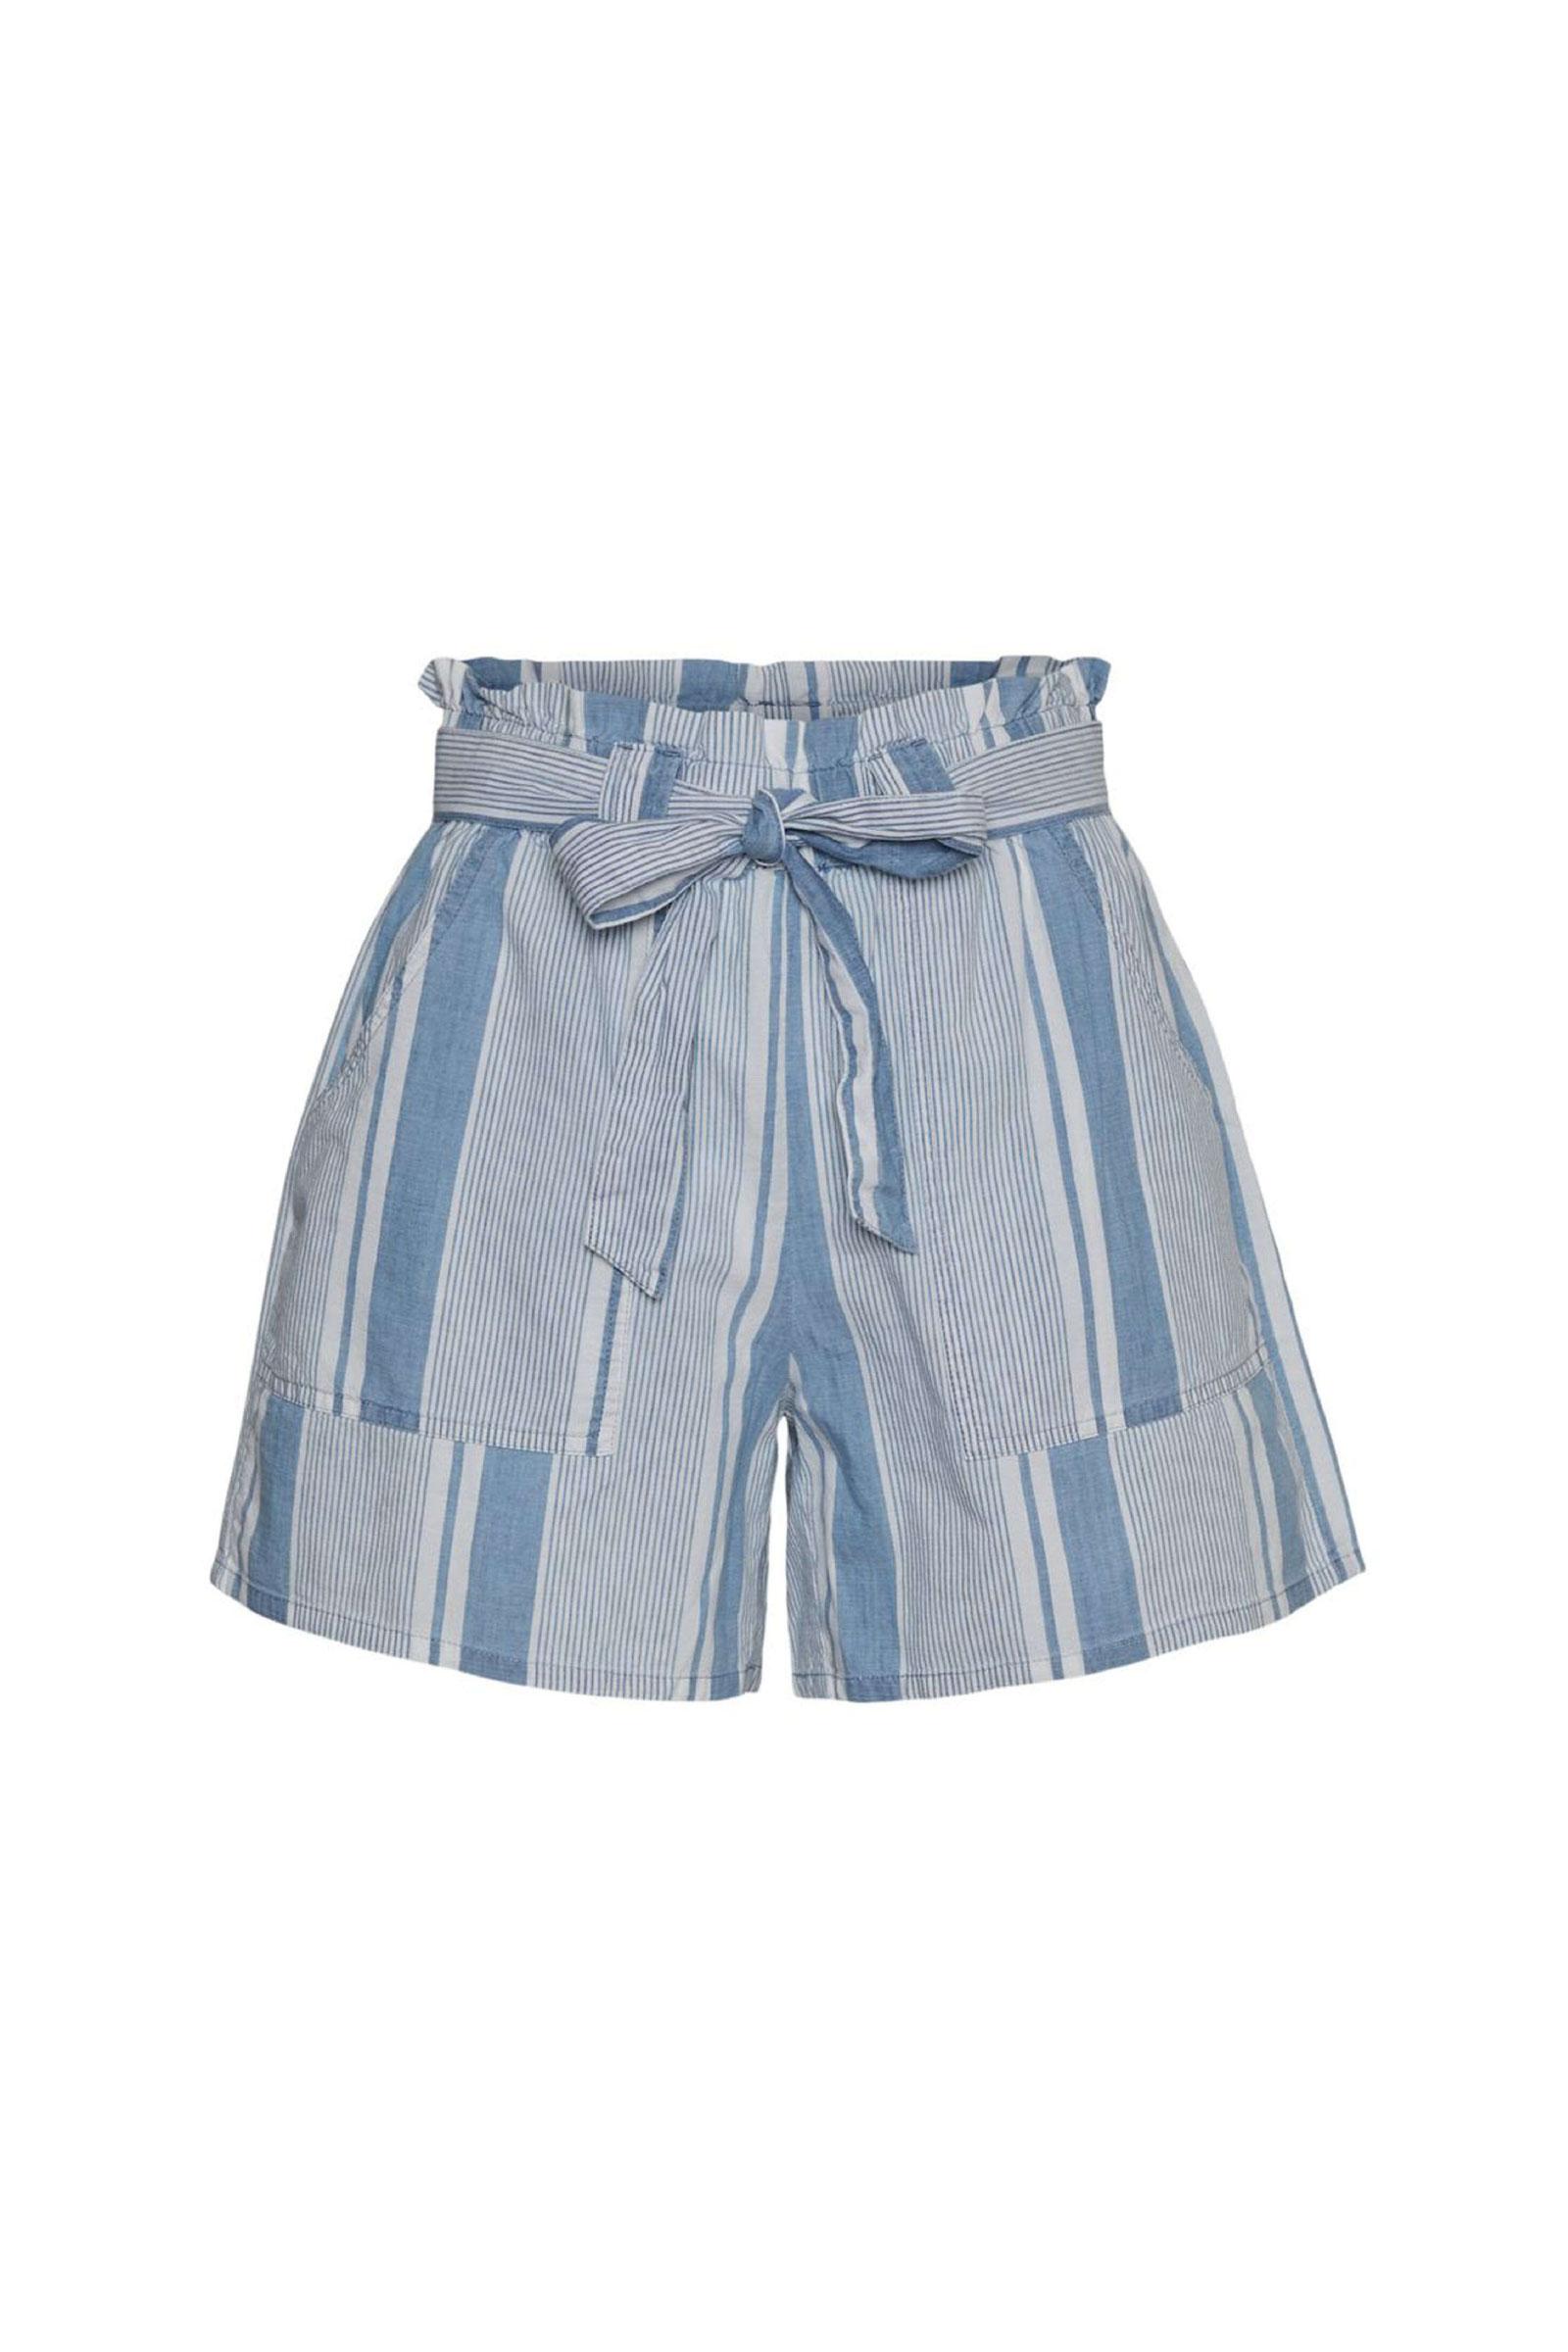 VERO MODA Shorts Woman VERO MODA |  | 10244775Stripes-WHITE